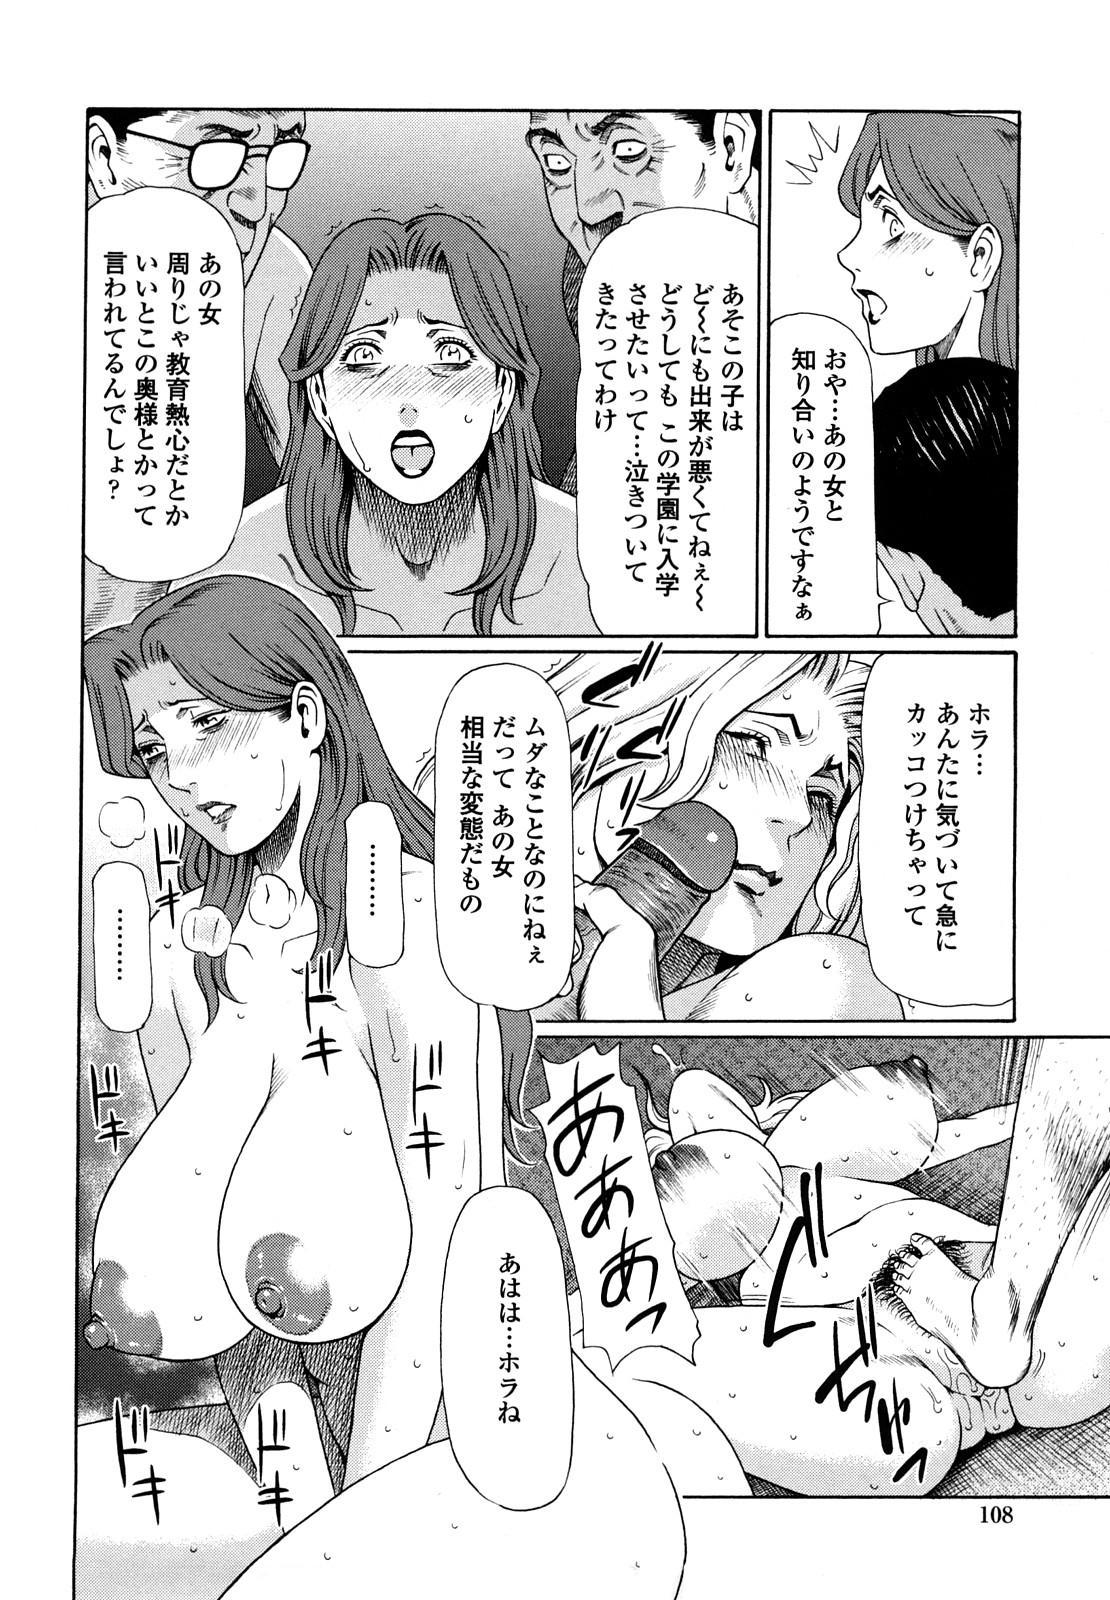 [Takasugi Kou] Kindan no Haha-Ana - Immorality Love-Hole [Decensored] 109